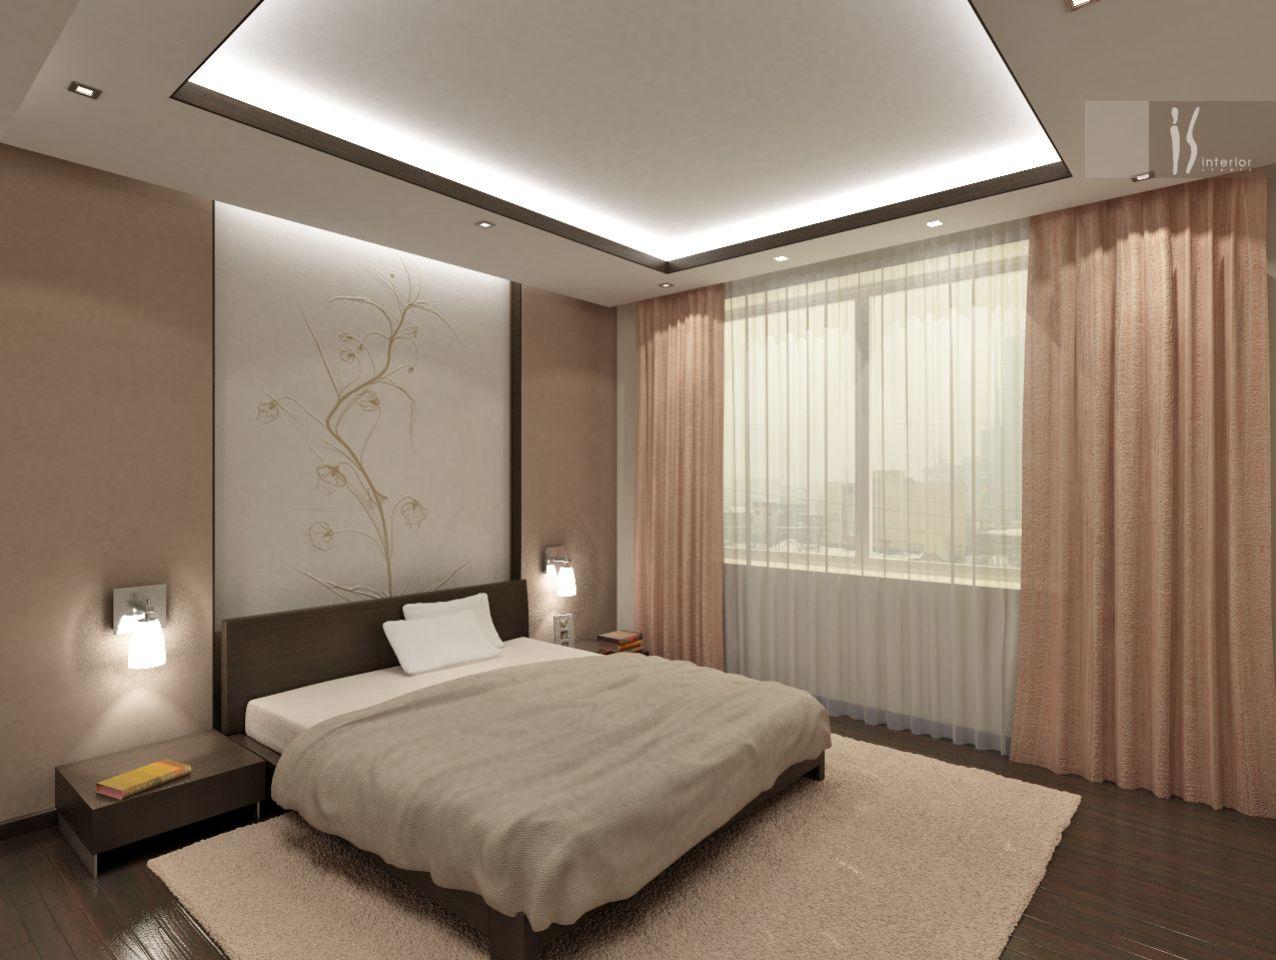 интерьеры фото спальни